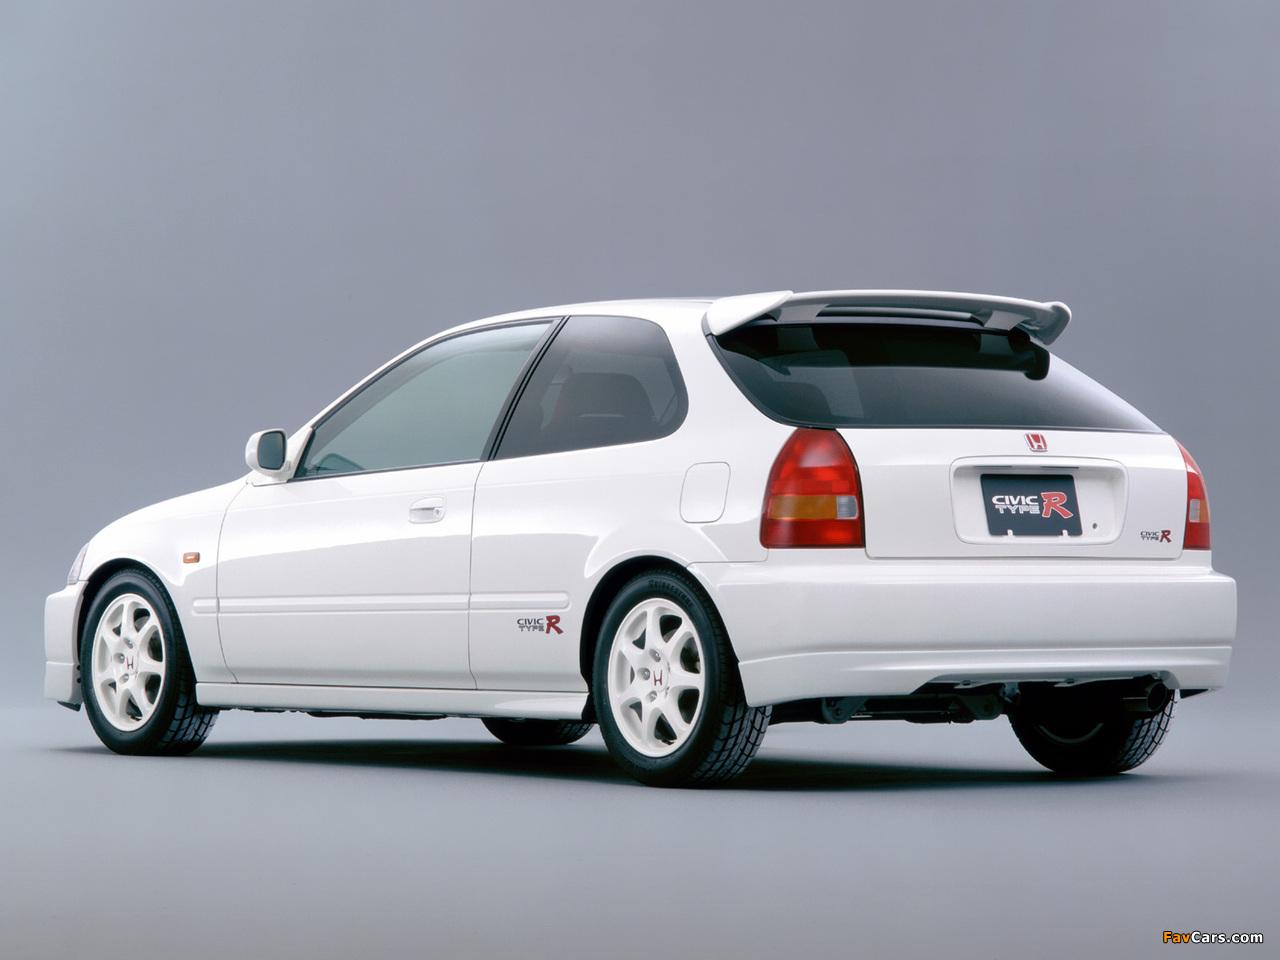 Kekurangan Honda Civic Type R 2000 Spesifikasi